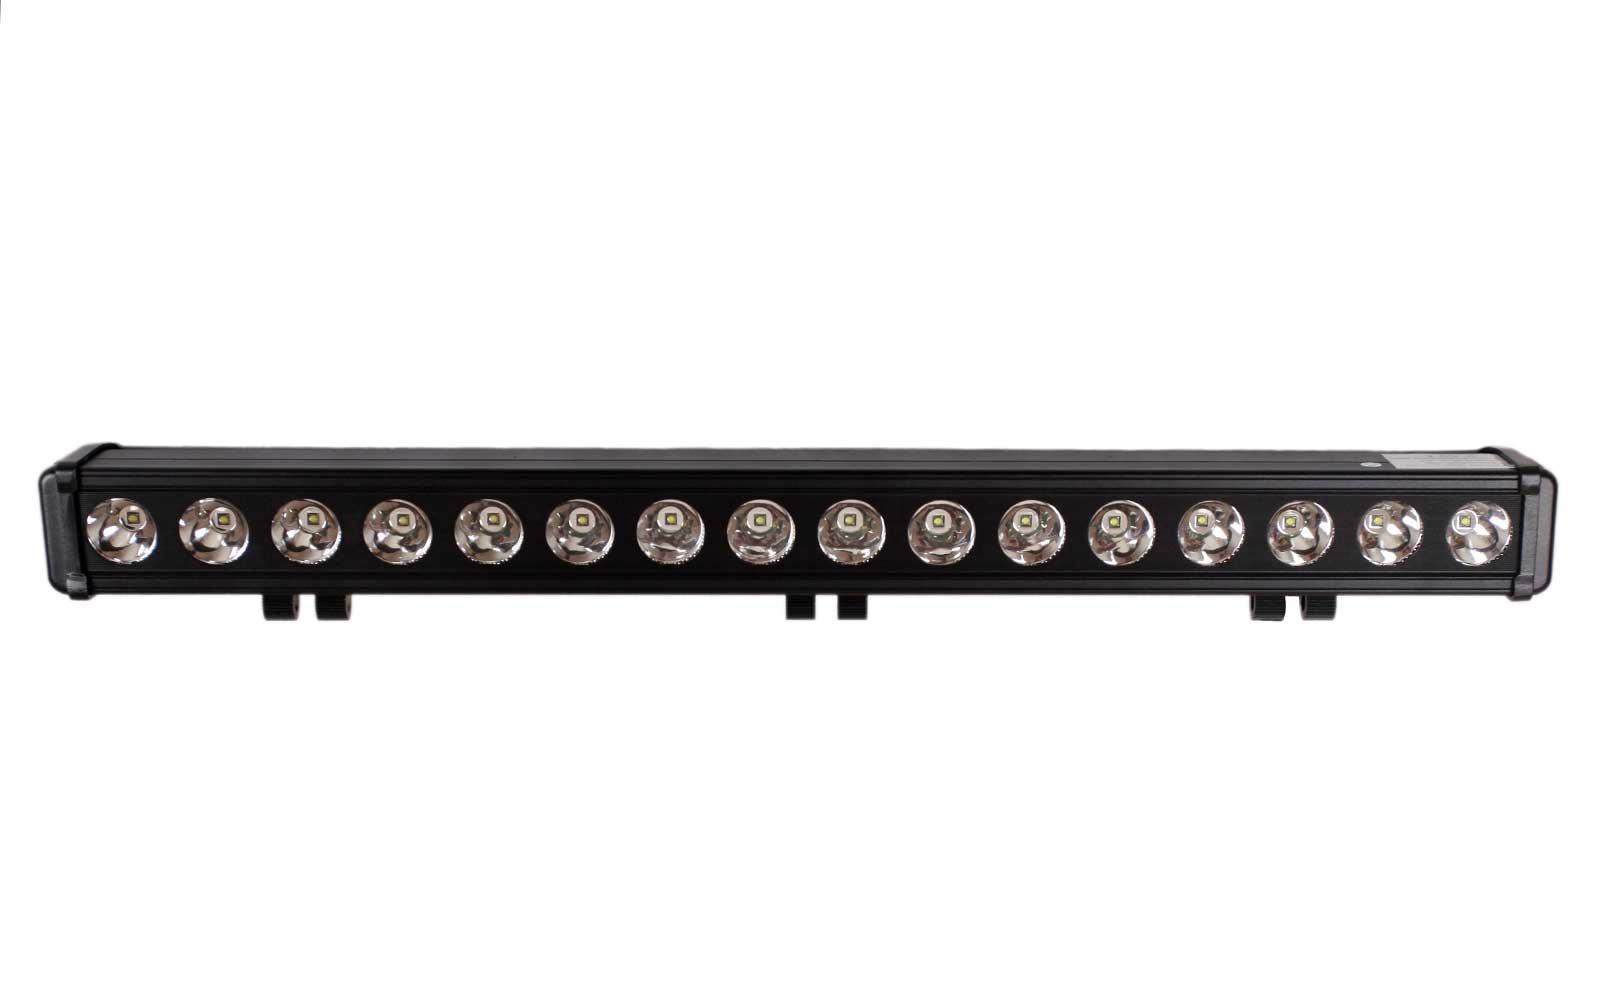 Big cree single row led light bar 30 inch 160 watt spot tuff single row led light bar 30 inch 160 watt spot rogue30in160w5 aloadofball Images